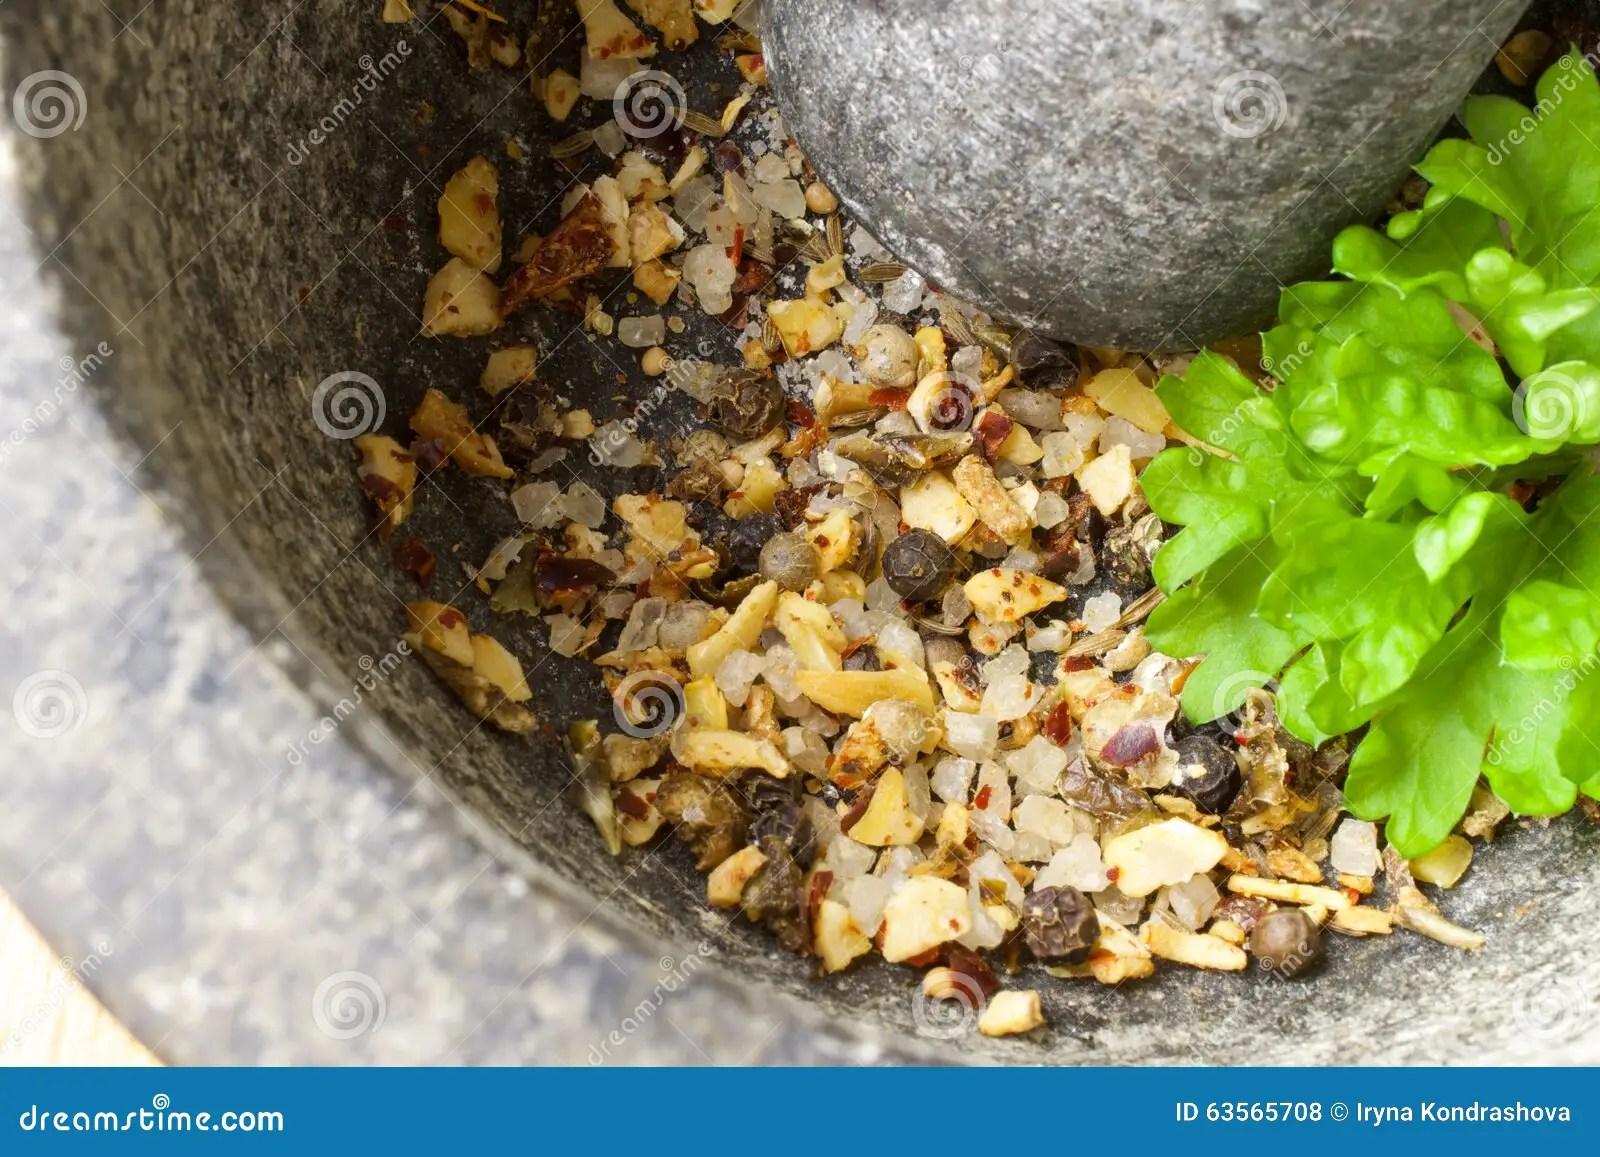 kitchen aid grinder black cabinets 在研磨机的香料库存照片 图片包括有香料 准备 草本 厨师 荷兰芹 在研磨机的香料